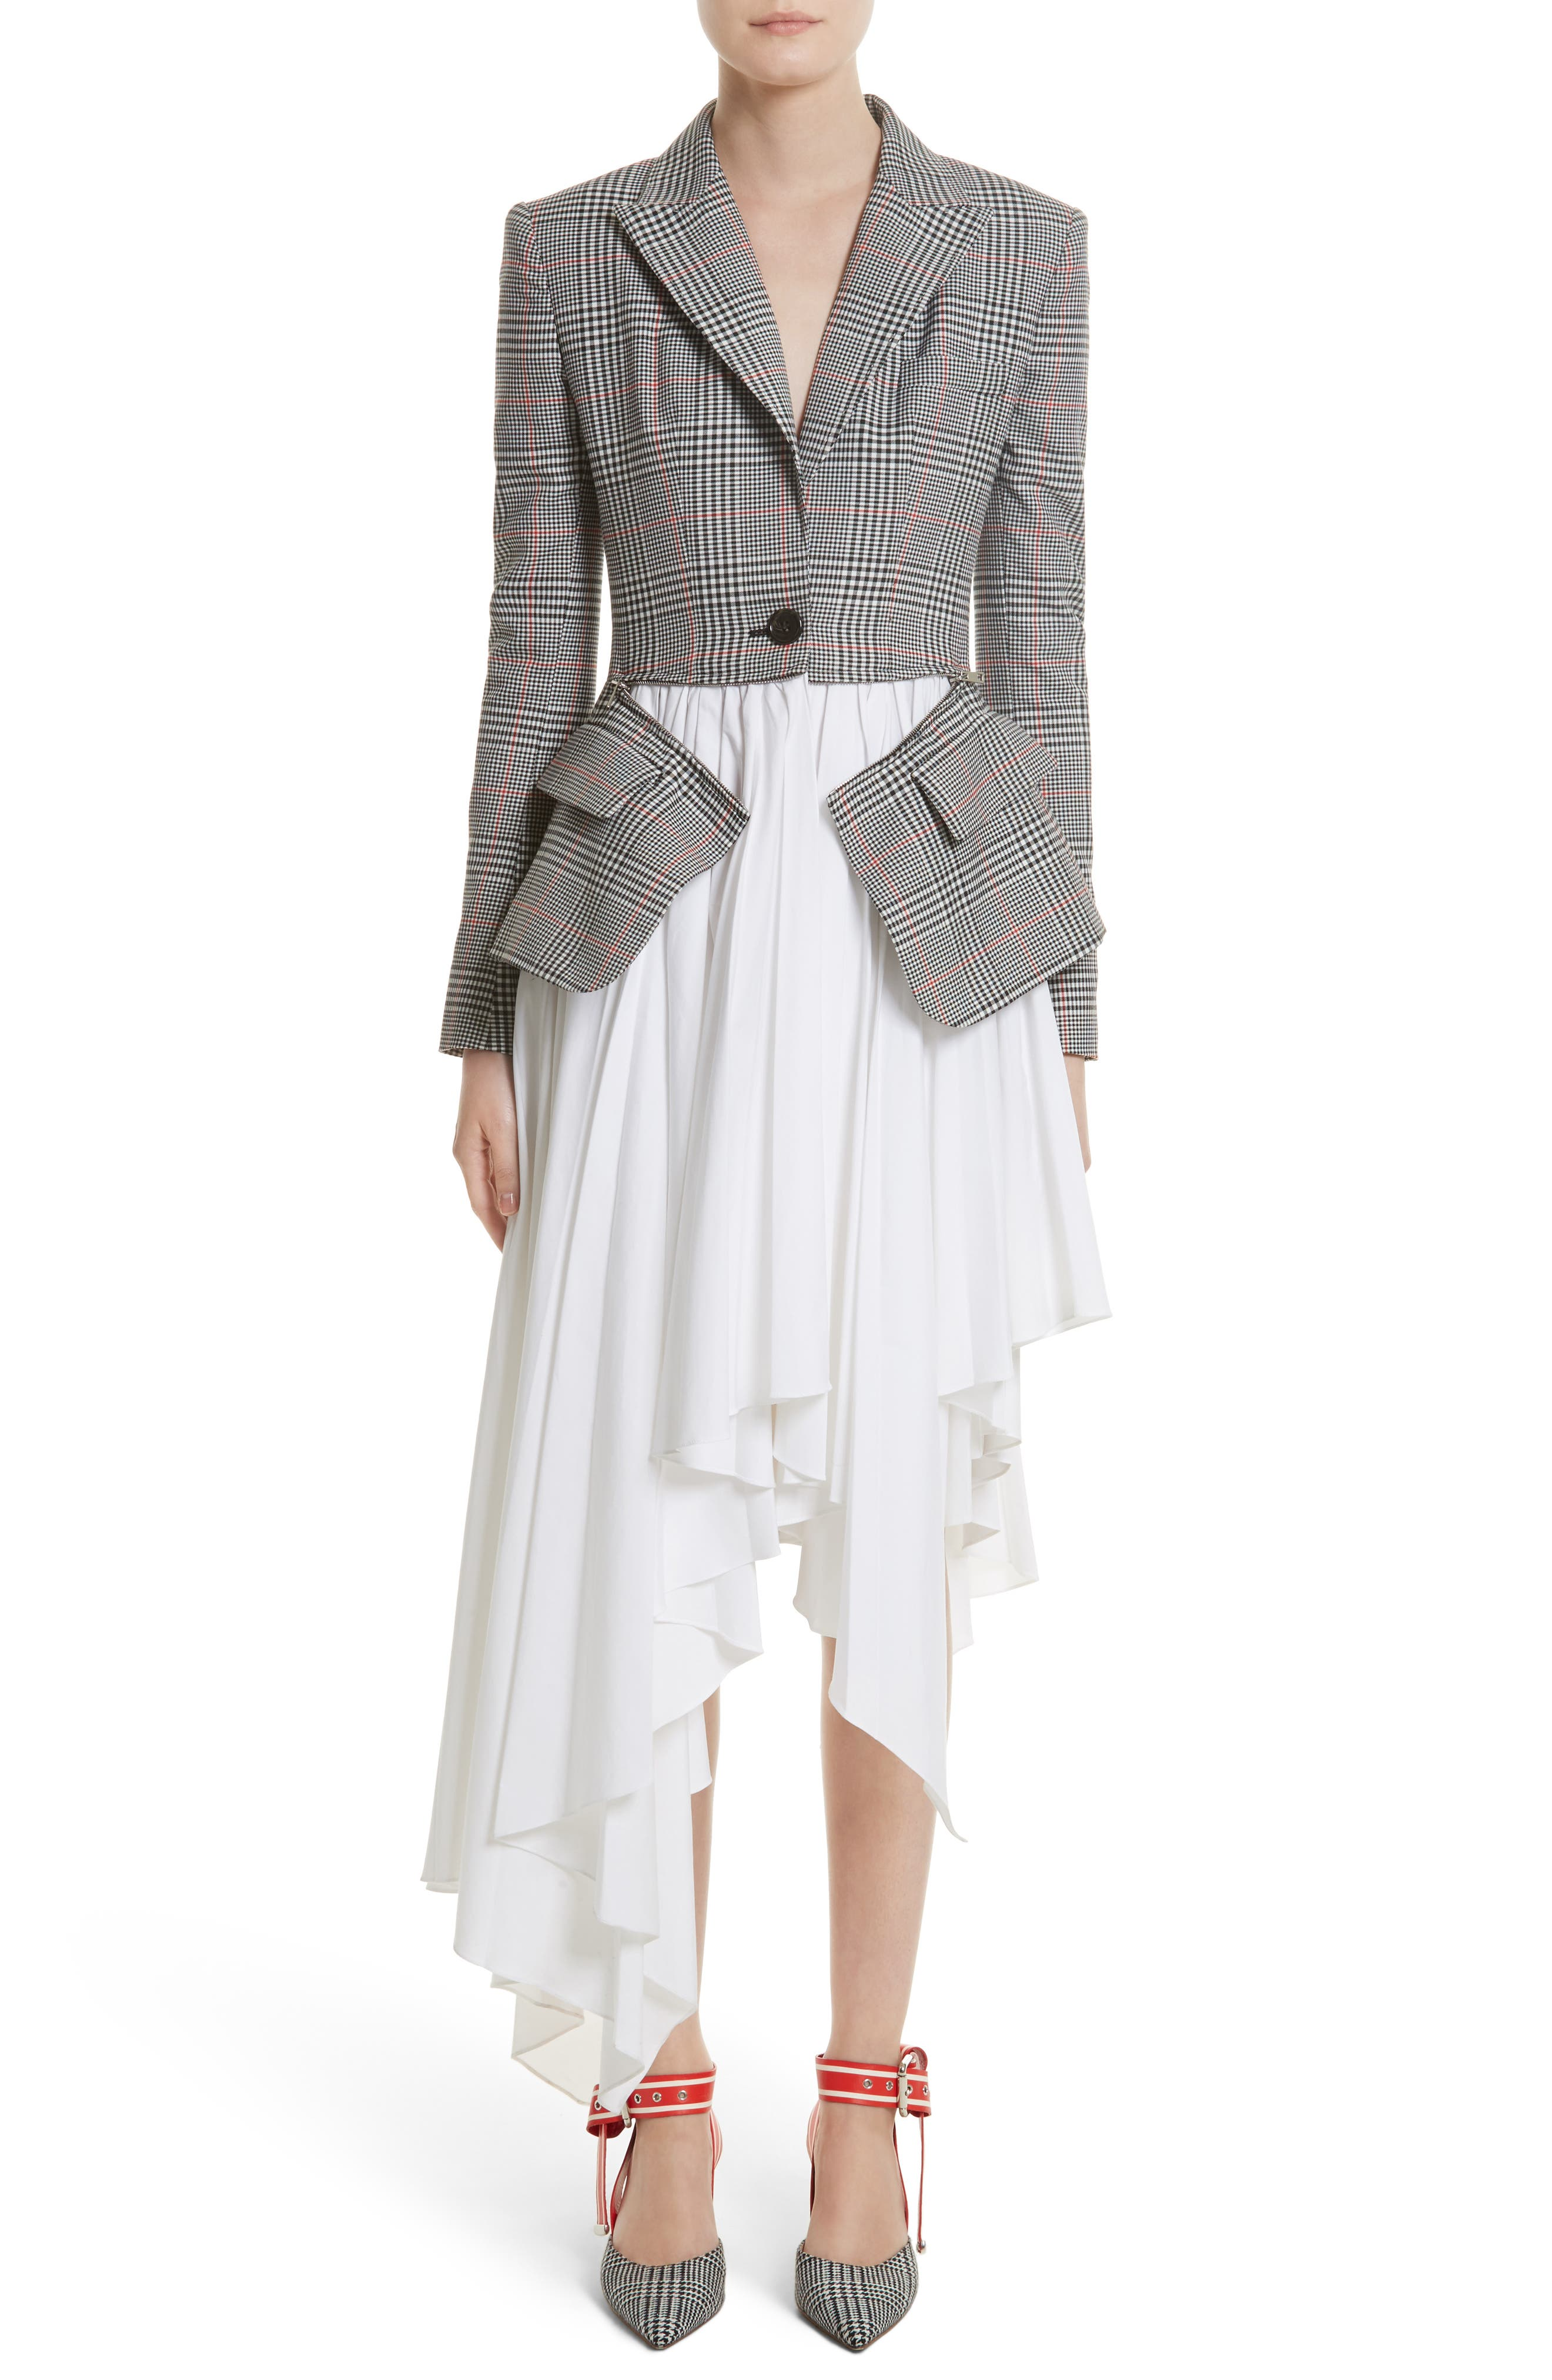 Glen Plaid Jacket Dress,                             Main thumbnail 1, color,                             Black